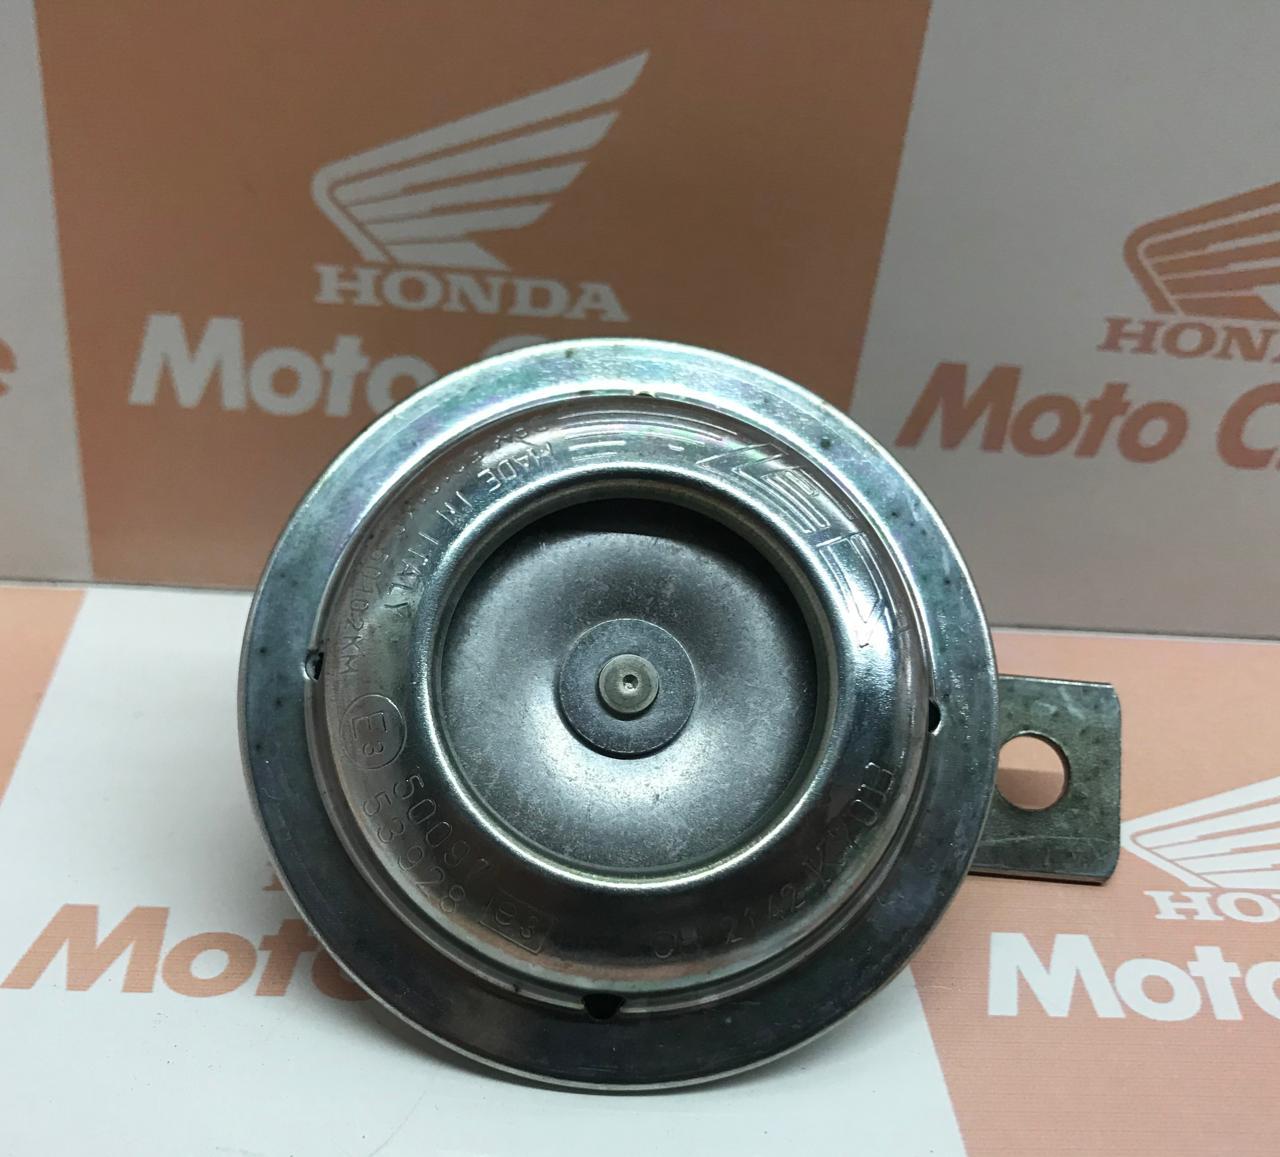 Buzina Biz 125 Original Honda 38110GAVE00